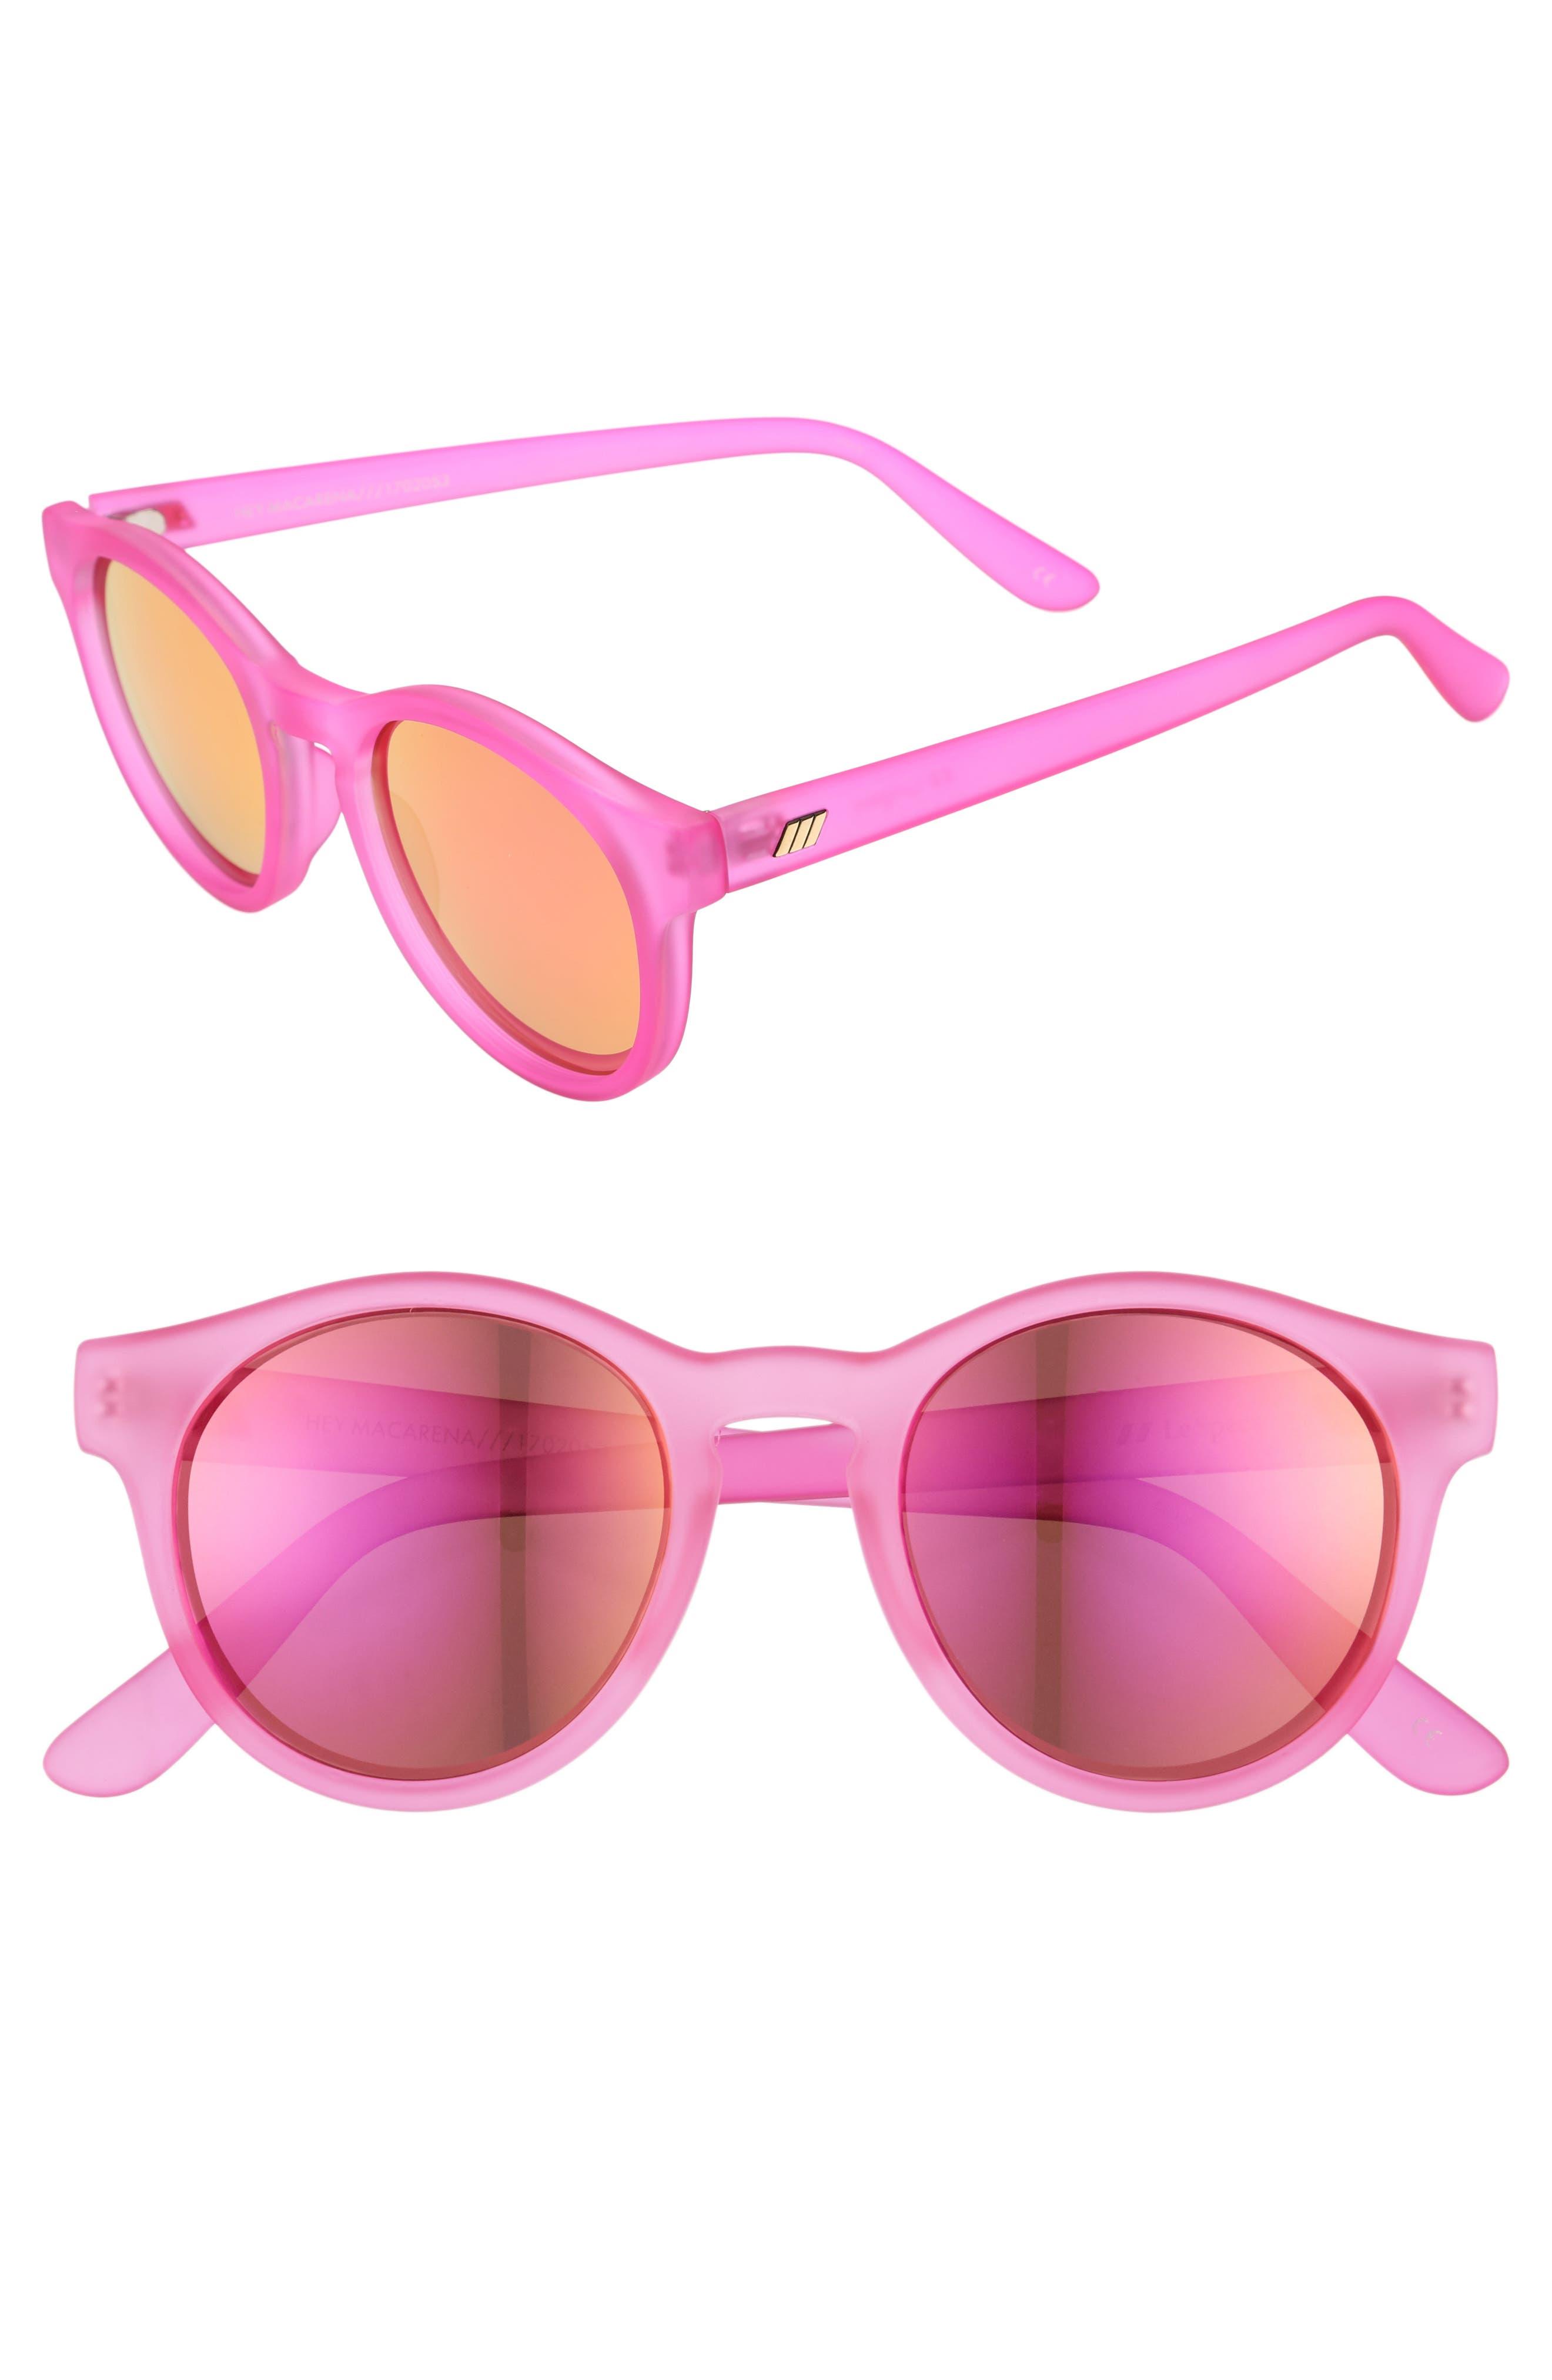 Main Image - Le Specs Hey Macarena 51mm Round Sunglasses